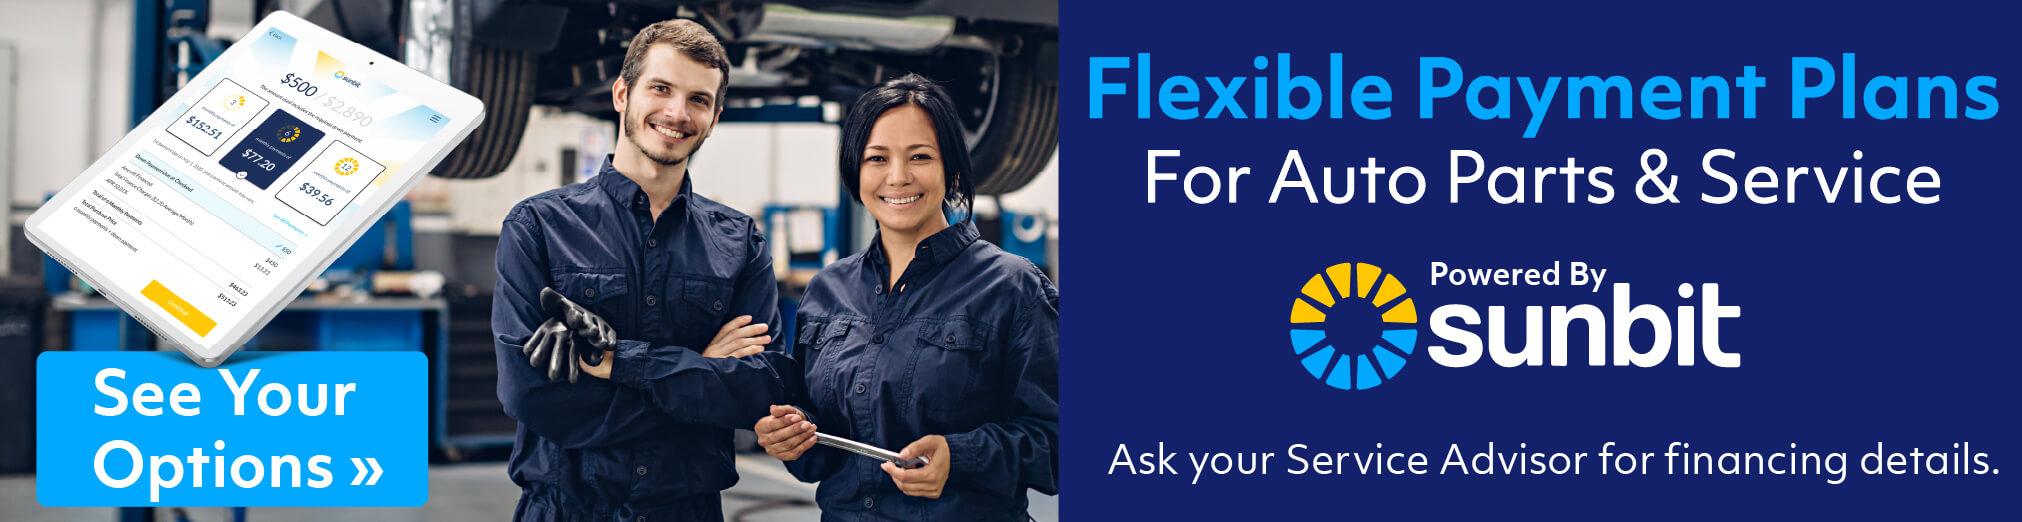 Flexible Payment Plans for Auto Parts & Service Powered by Sunbit